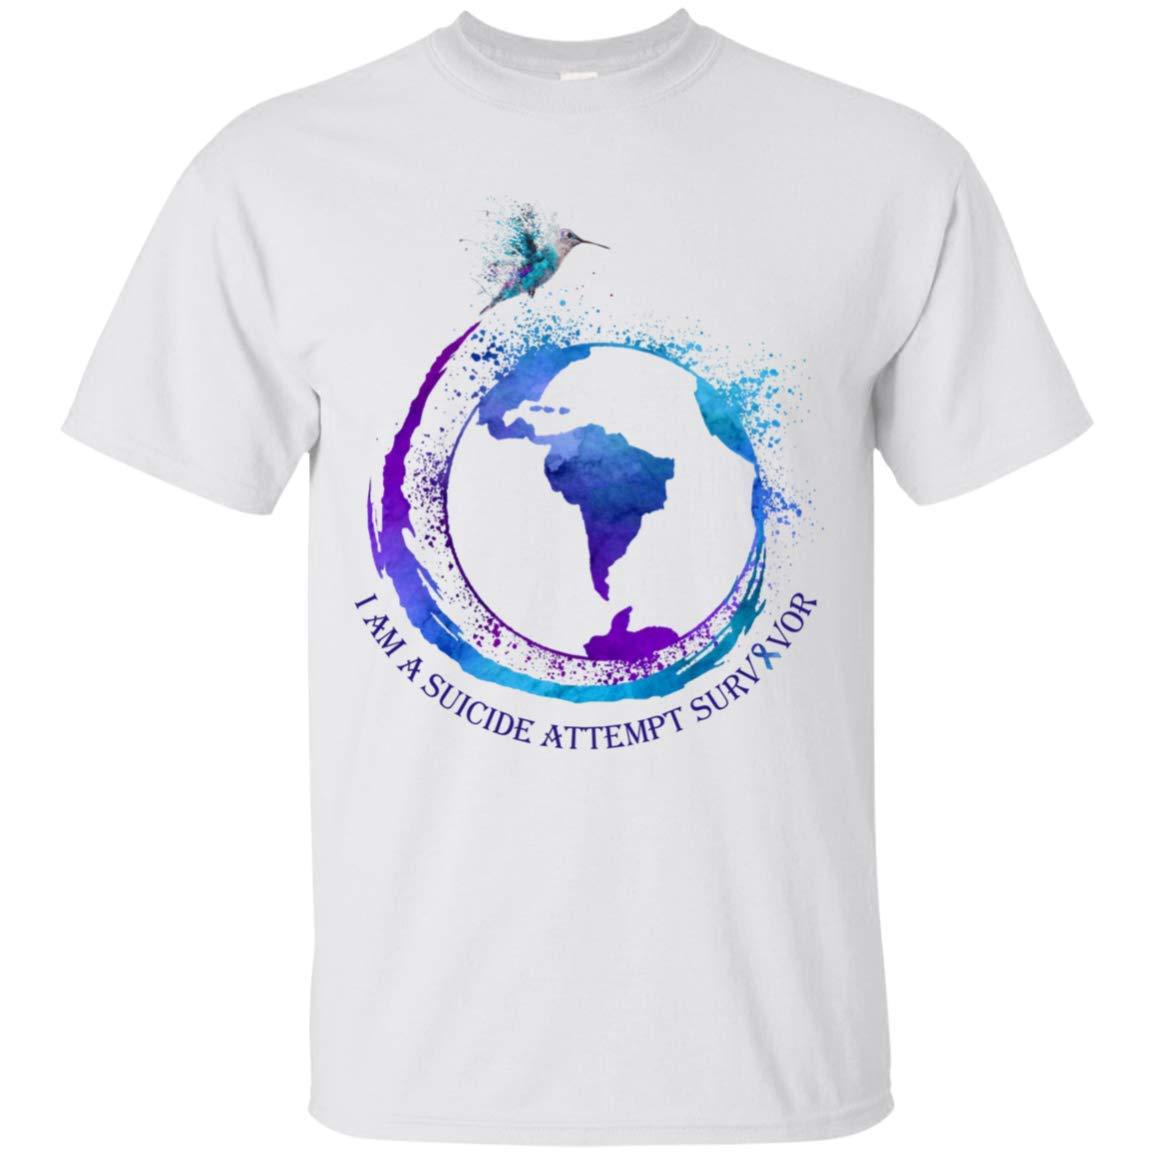 Mktee I Am A Suicide Attempt Survivor Suicide Awareness Tshirt For S 5056